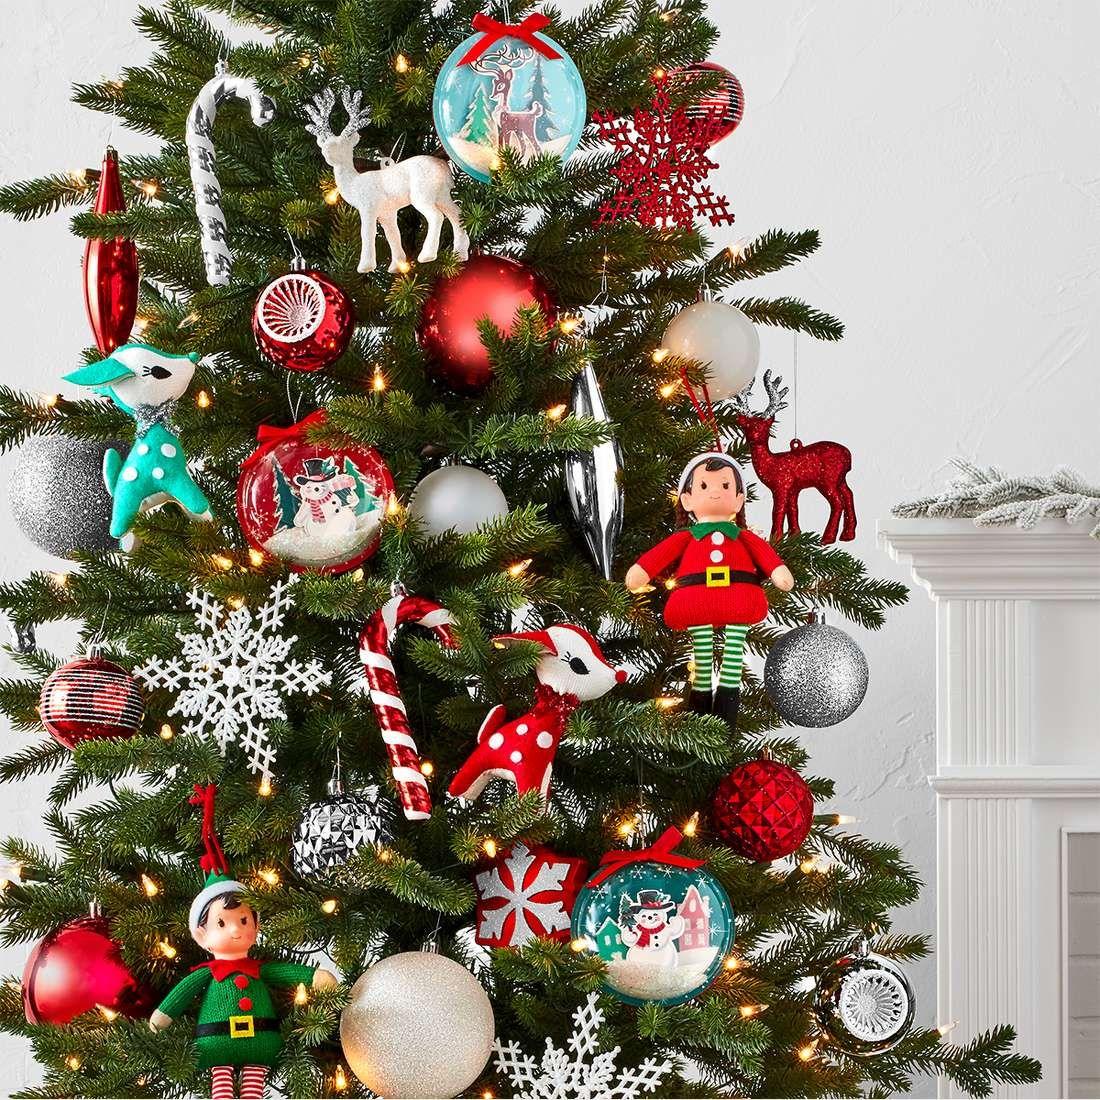 Ho Ho Ho It S The Season For Great Decor Shop Target For Christmas Ornaments T Christmas Ornament Sets Amazing Christmas Trees Christmas Ornament Storage